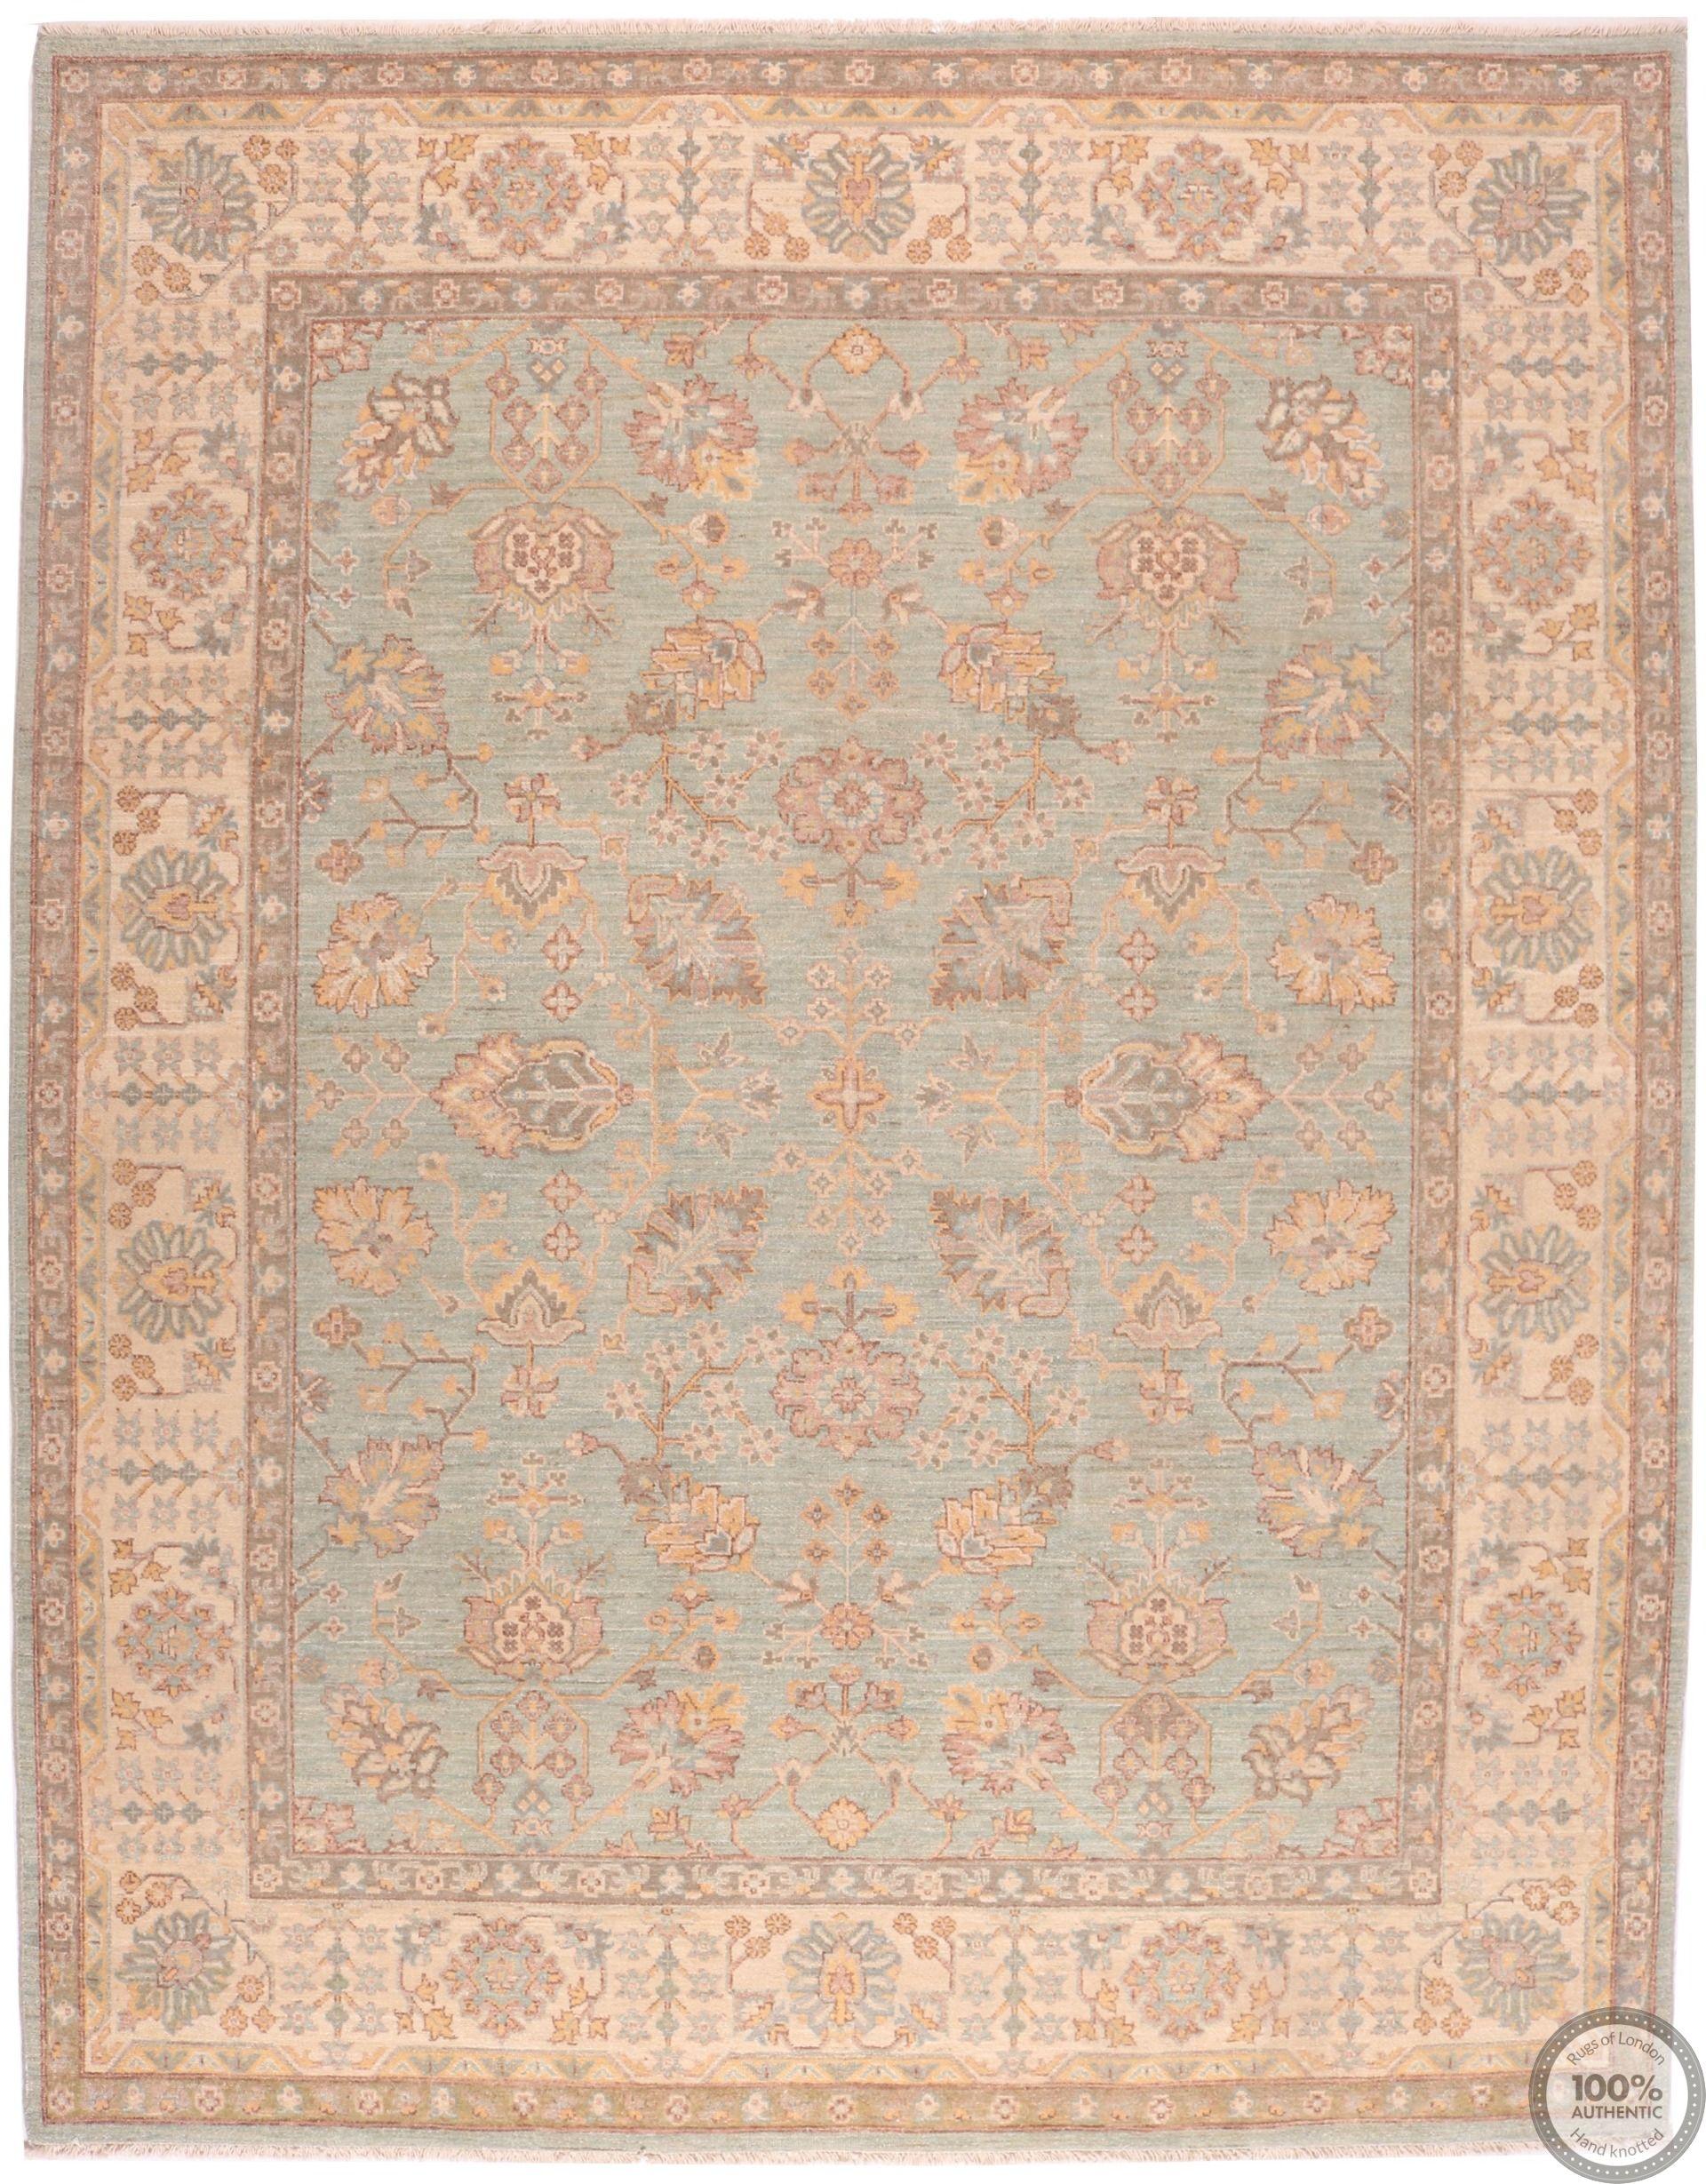 Garous Ziegler design rug - 9'8 x 8'1